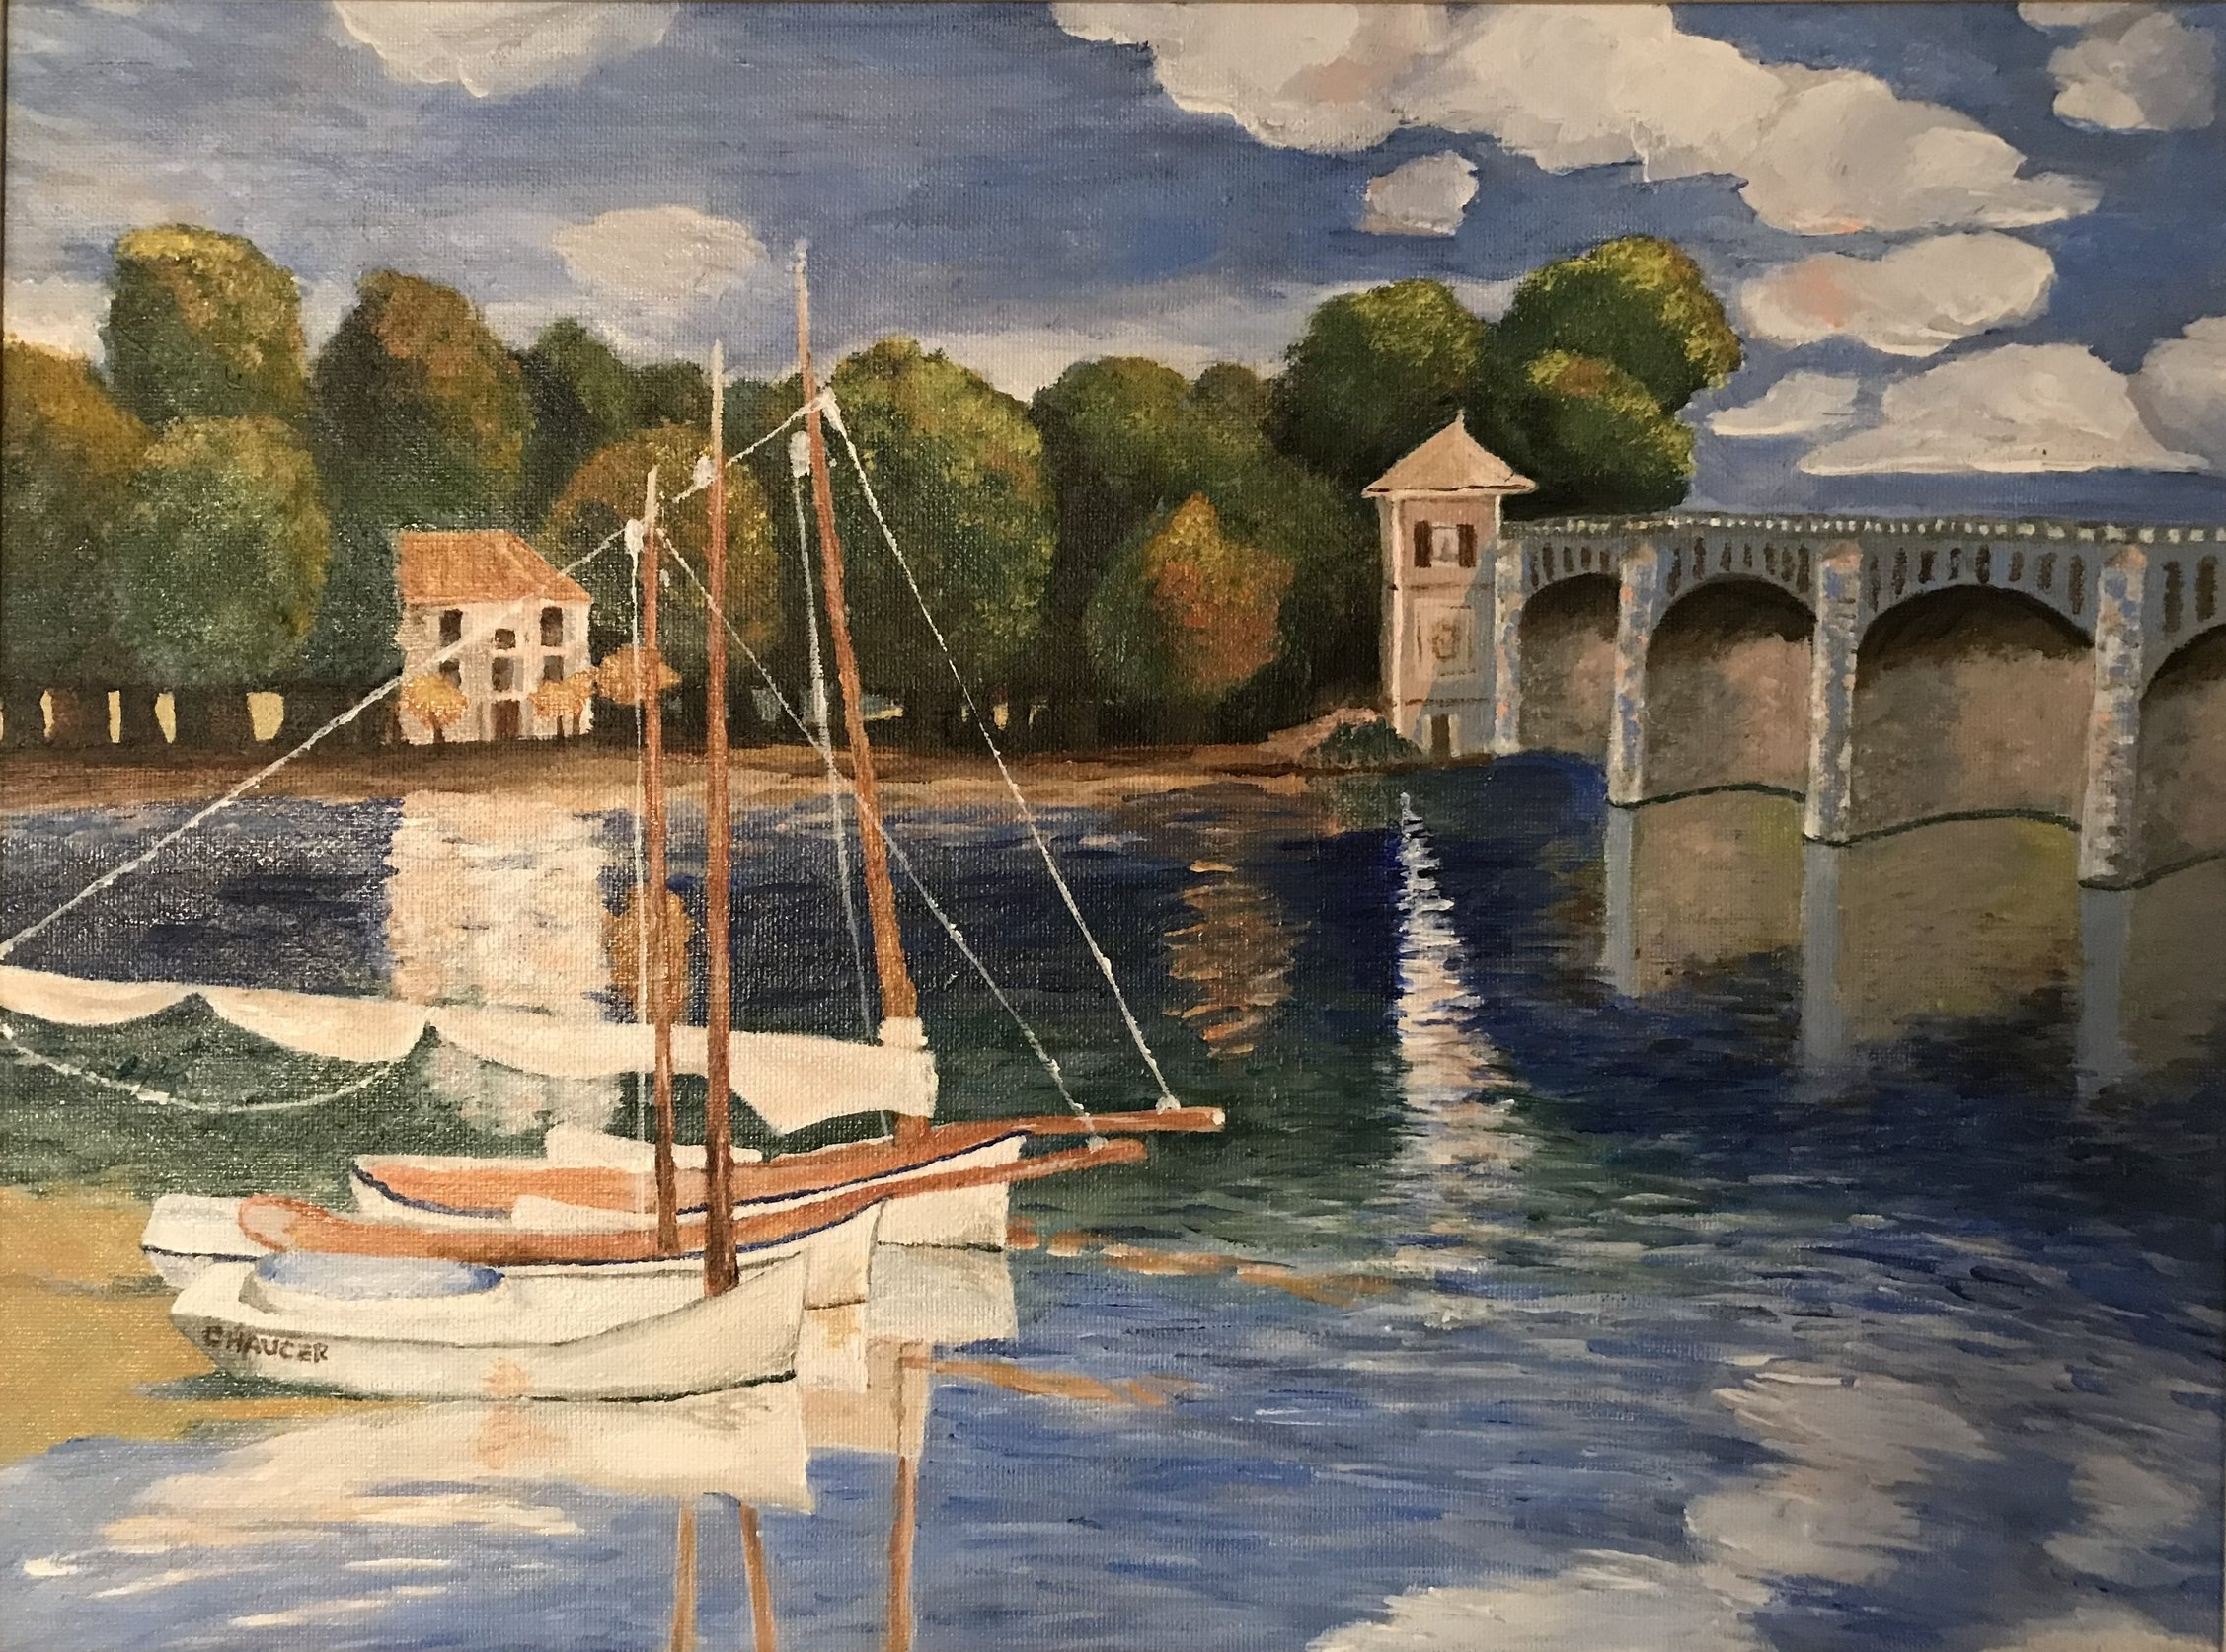 Monet replica, acrylic on canvas